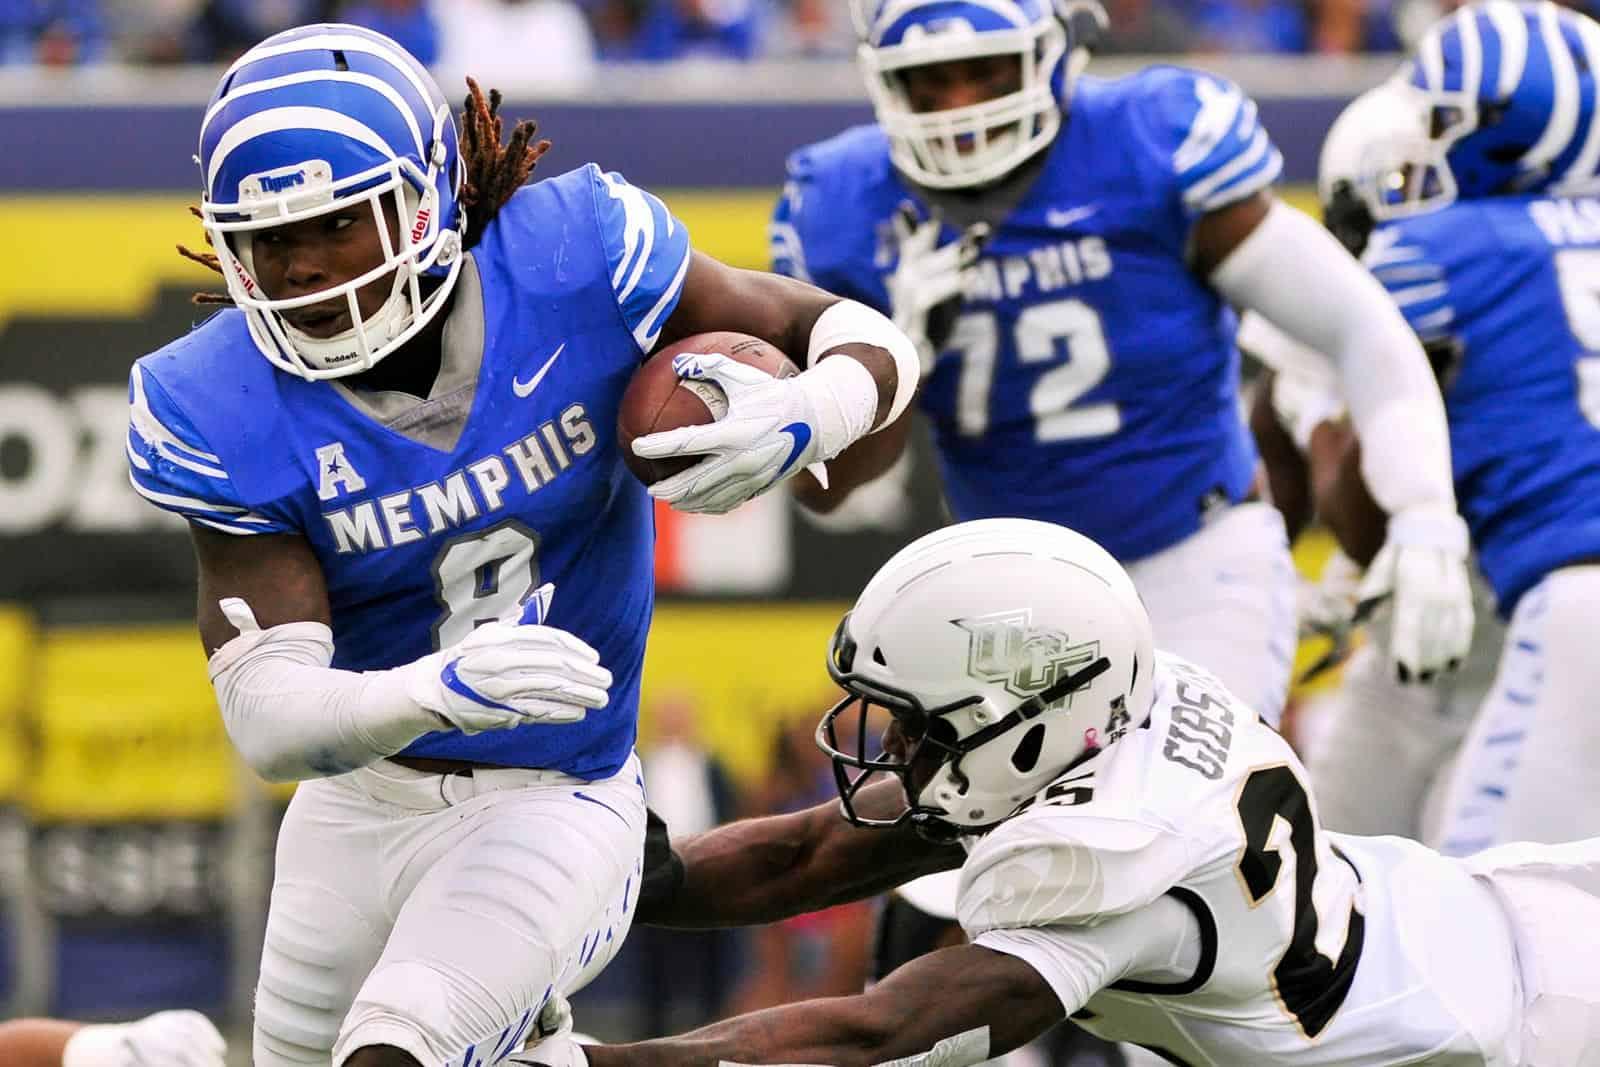 UCF-Memphis